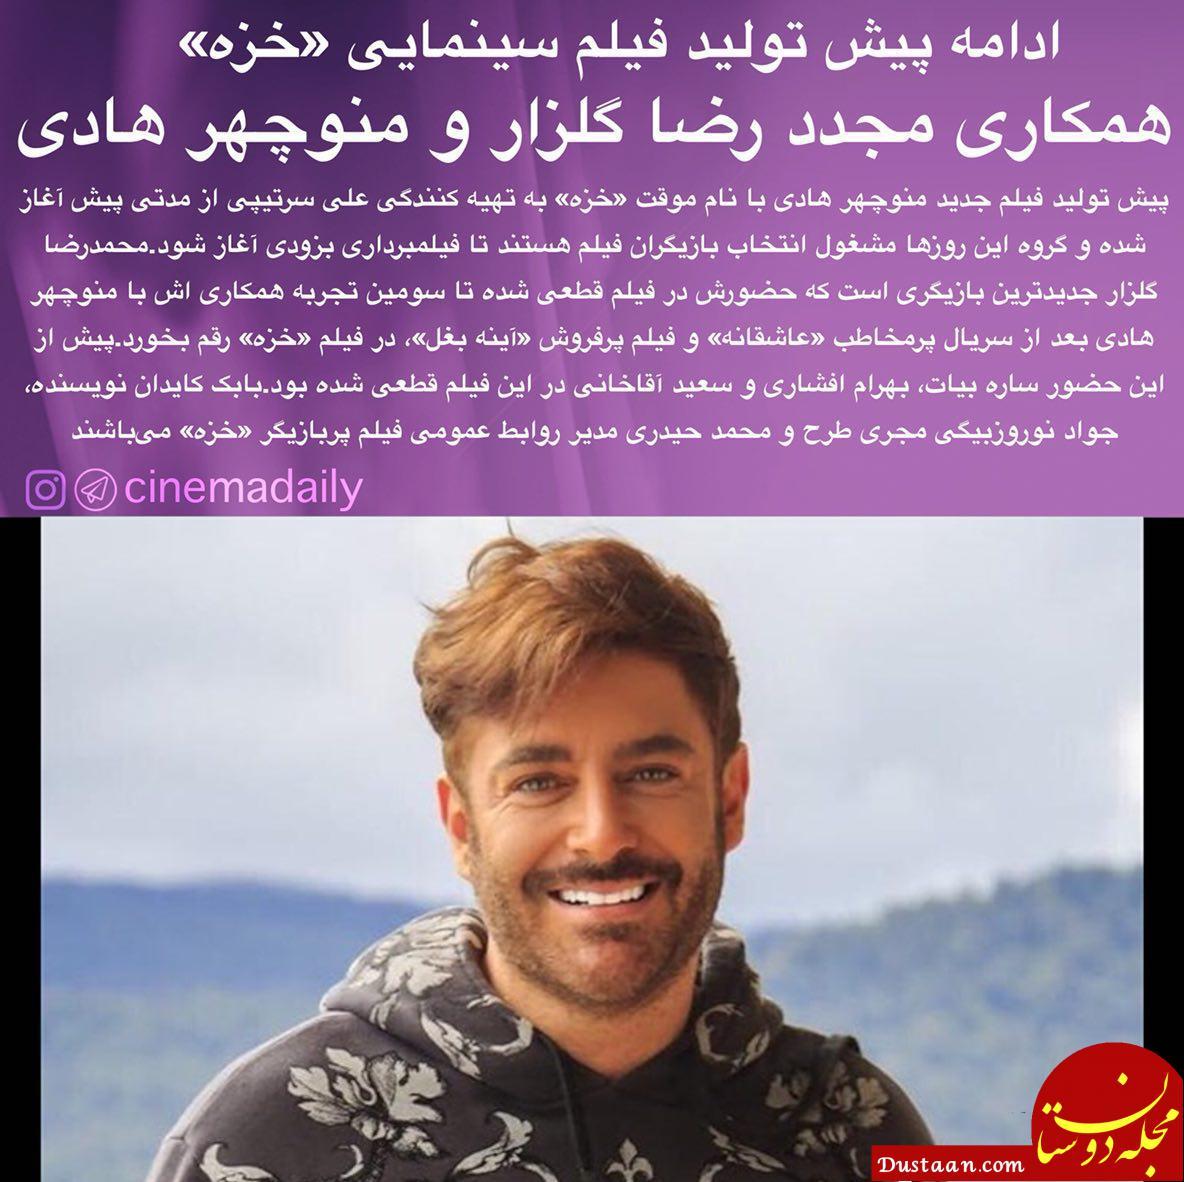 www.dustaan.com همکاری مجدد رضا گلزار و منوچهر هادی در «خزه»